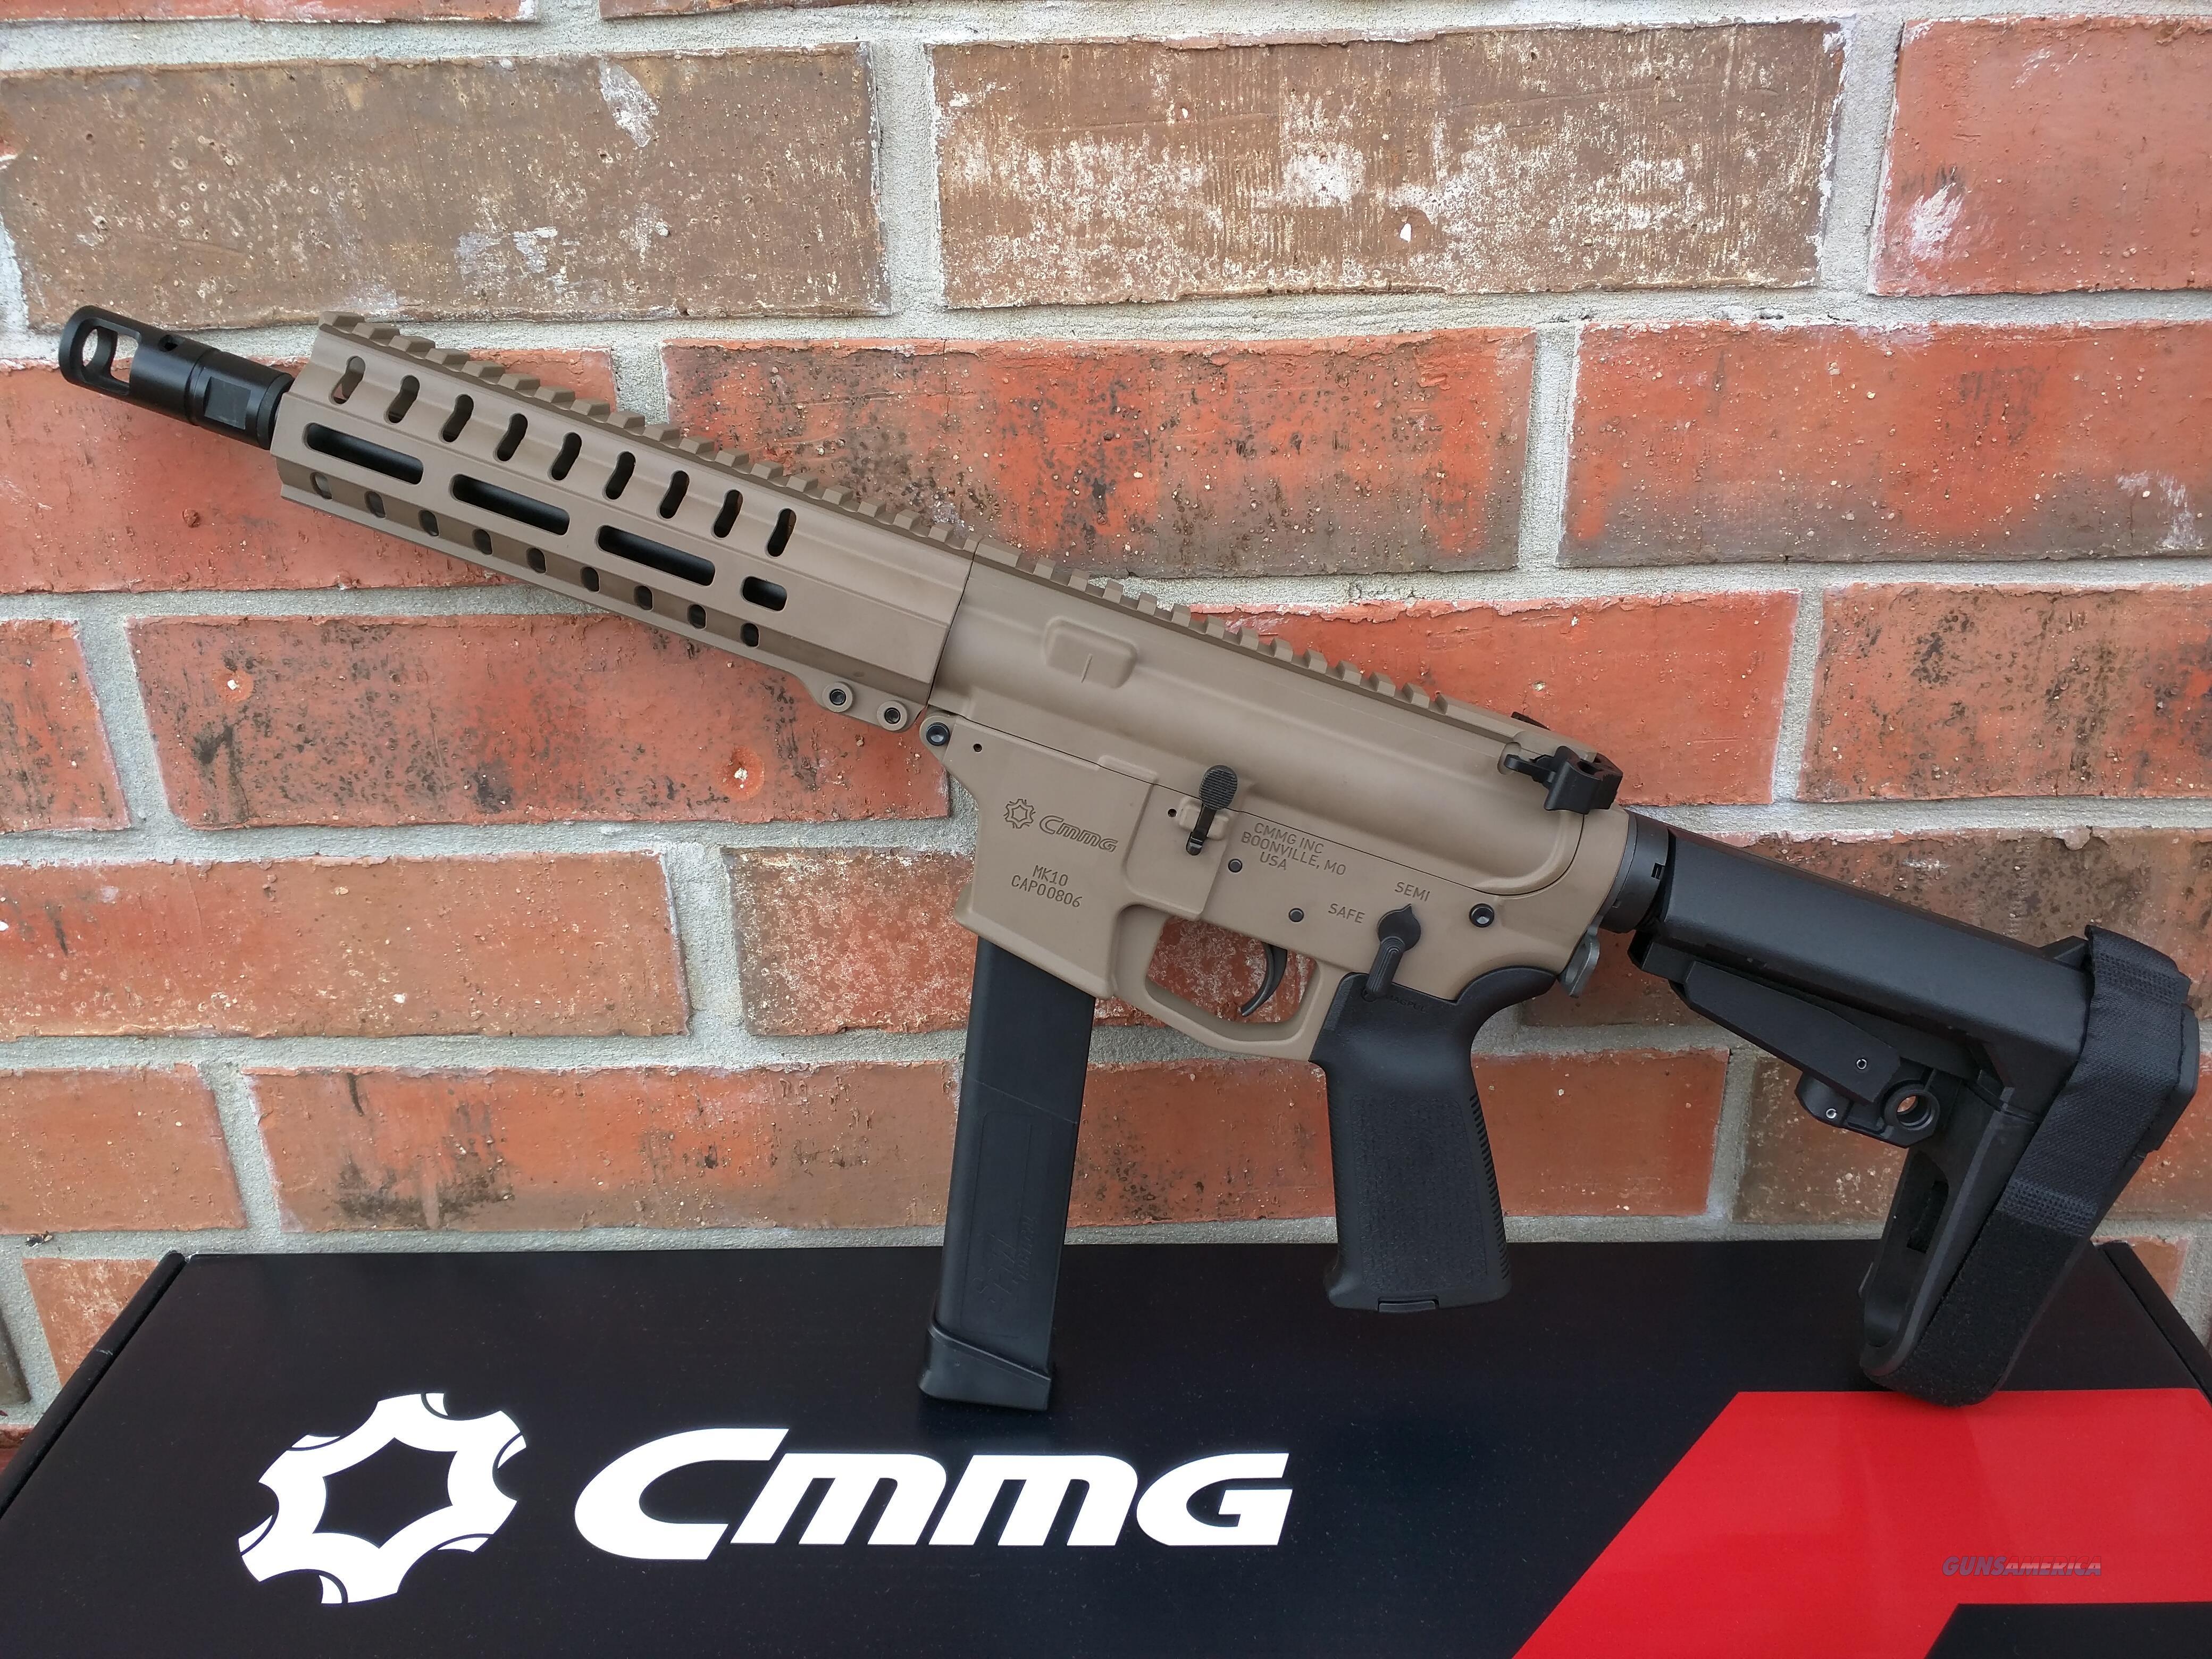 "CMMG Banshee 300 MK10 AR 15 Pistol 10mm FDE 8"" , SBA3 Pistol Brace ,30 Rd Magazine Takes Glock Mags RADIAL DELAYED BLOWBACK Billet Alum.AMBI, NIB, NEW MODEL!! FREE LAYAWAY!!  Guns > Rifles > AR-15 Rifles - Small Manufacturers > Complete Rifle"